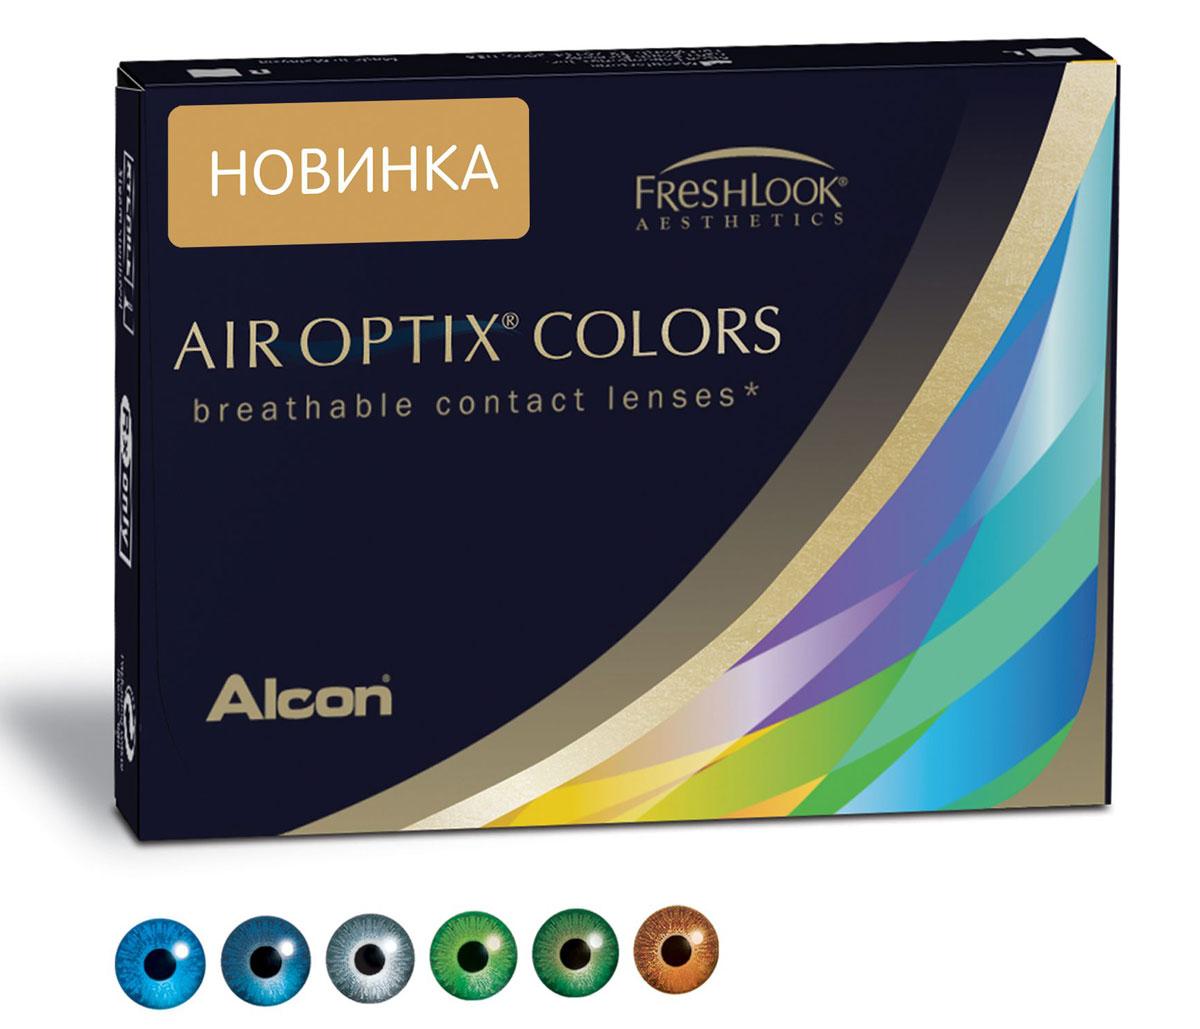 Аlcon контактные линзы Air Optix Colors 2 шт -4.00 Green